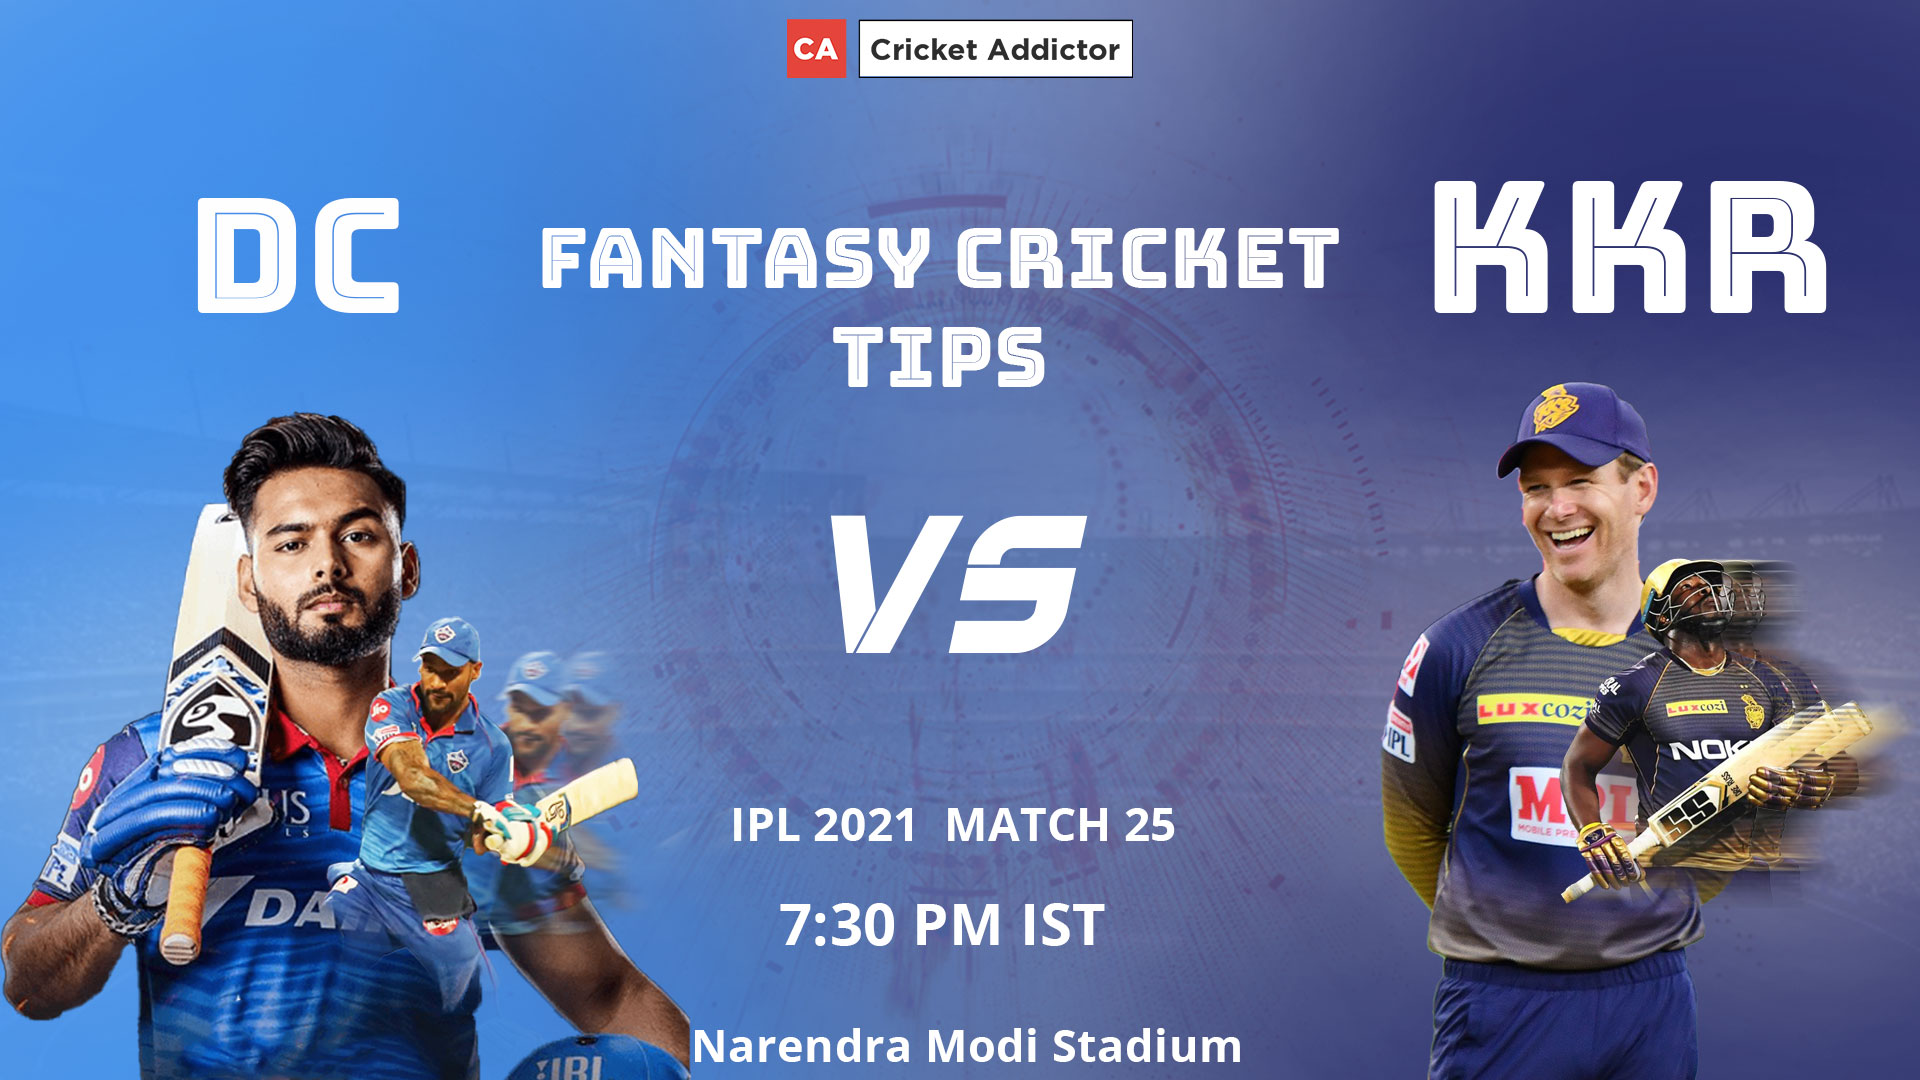 Delhi Capitals (DC) vs Kolkata Knight Riders (KKR) Dream11 Prediction, Fantasy Cricket Tips, Playing XI, Fantasy Team, Pitch Report, Dream11 Team, Injury Update of VIVO IPL 2021.